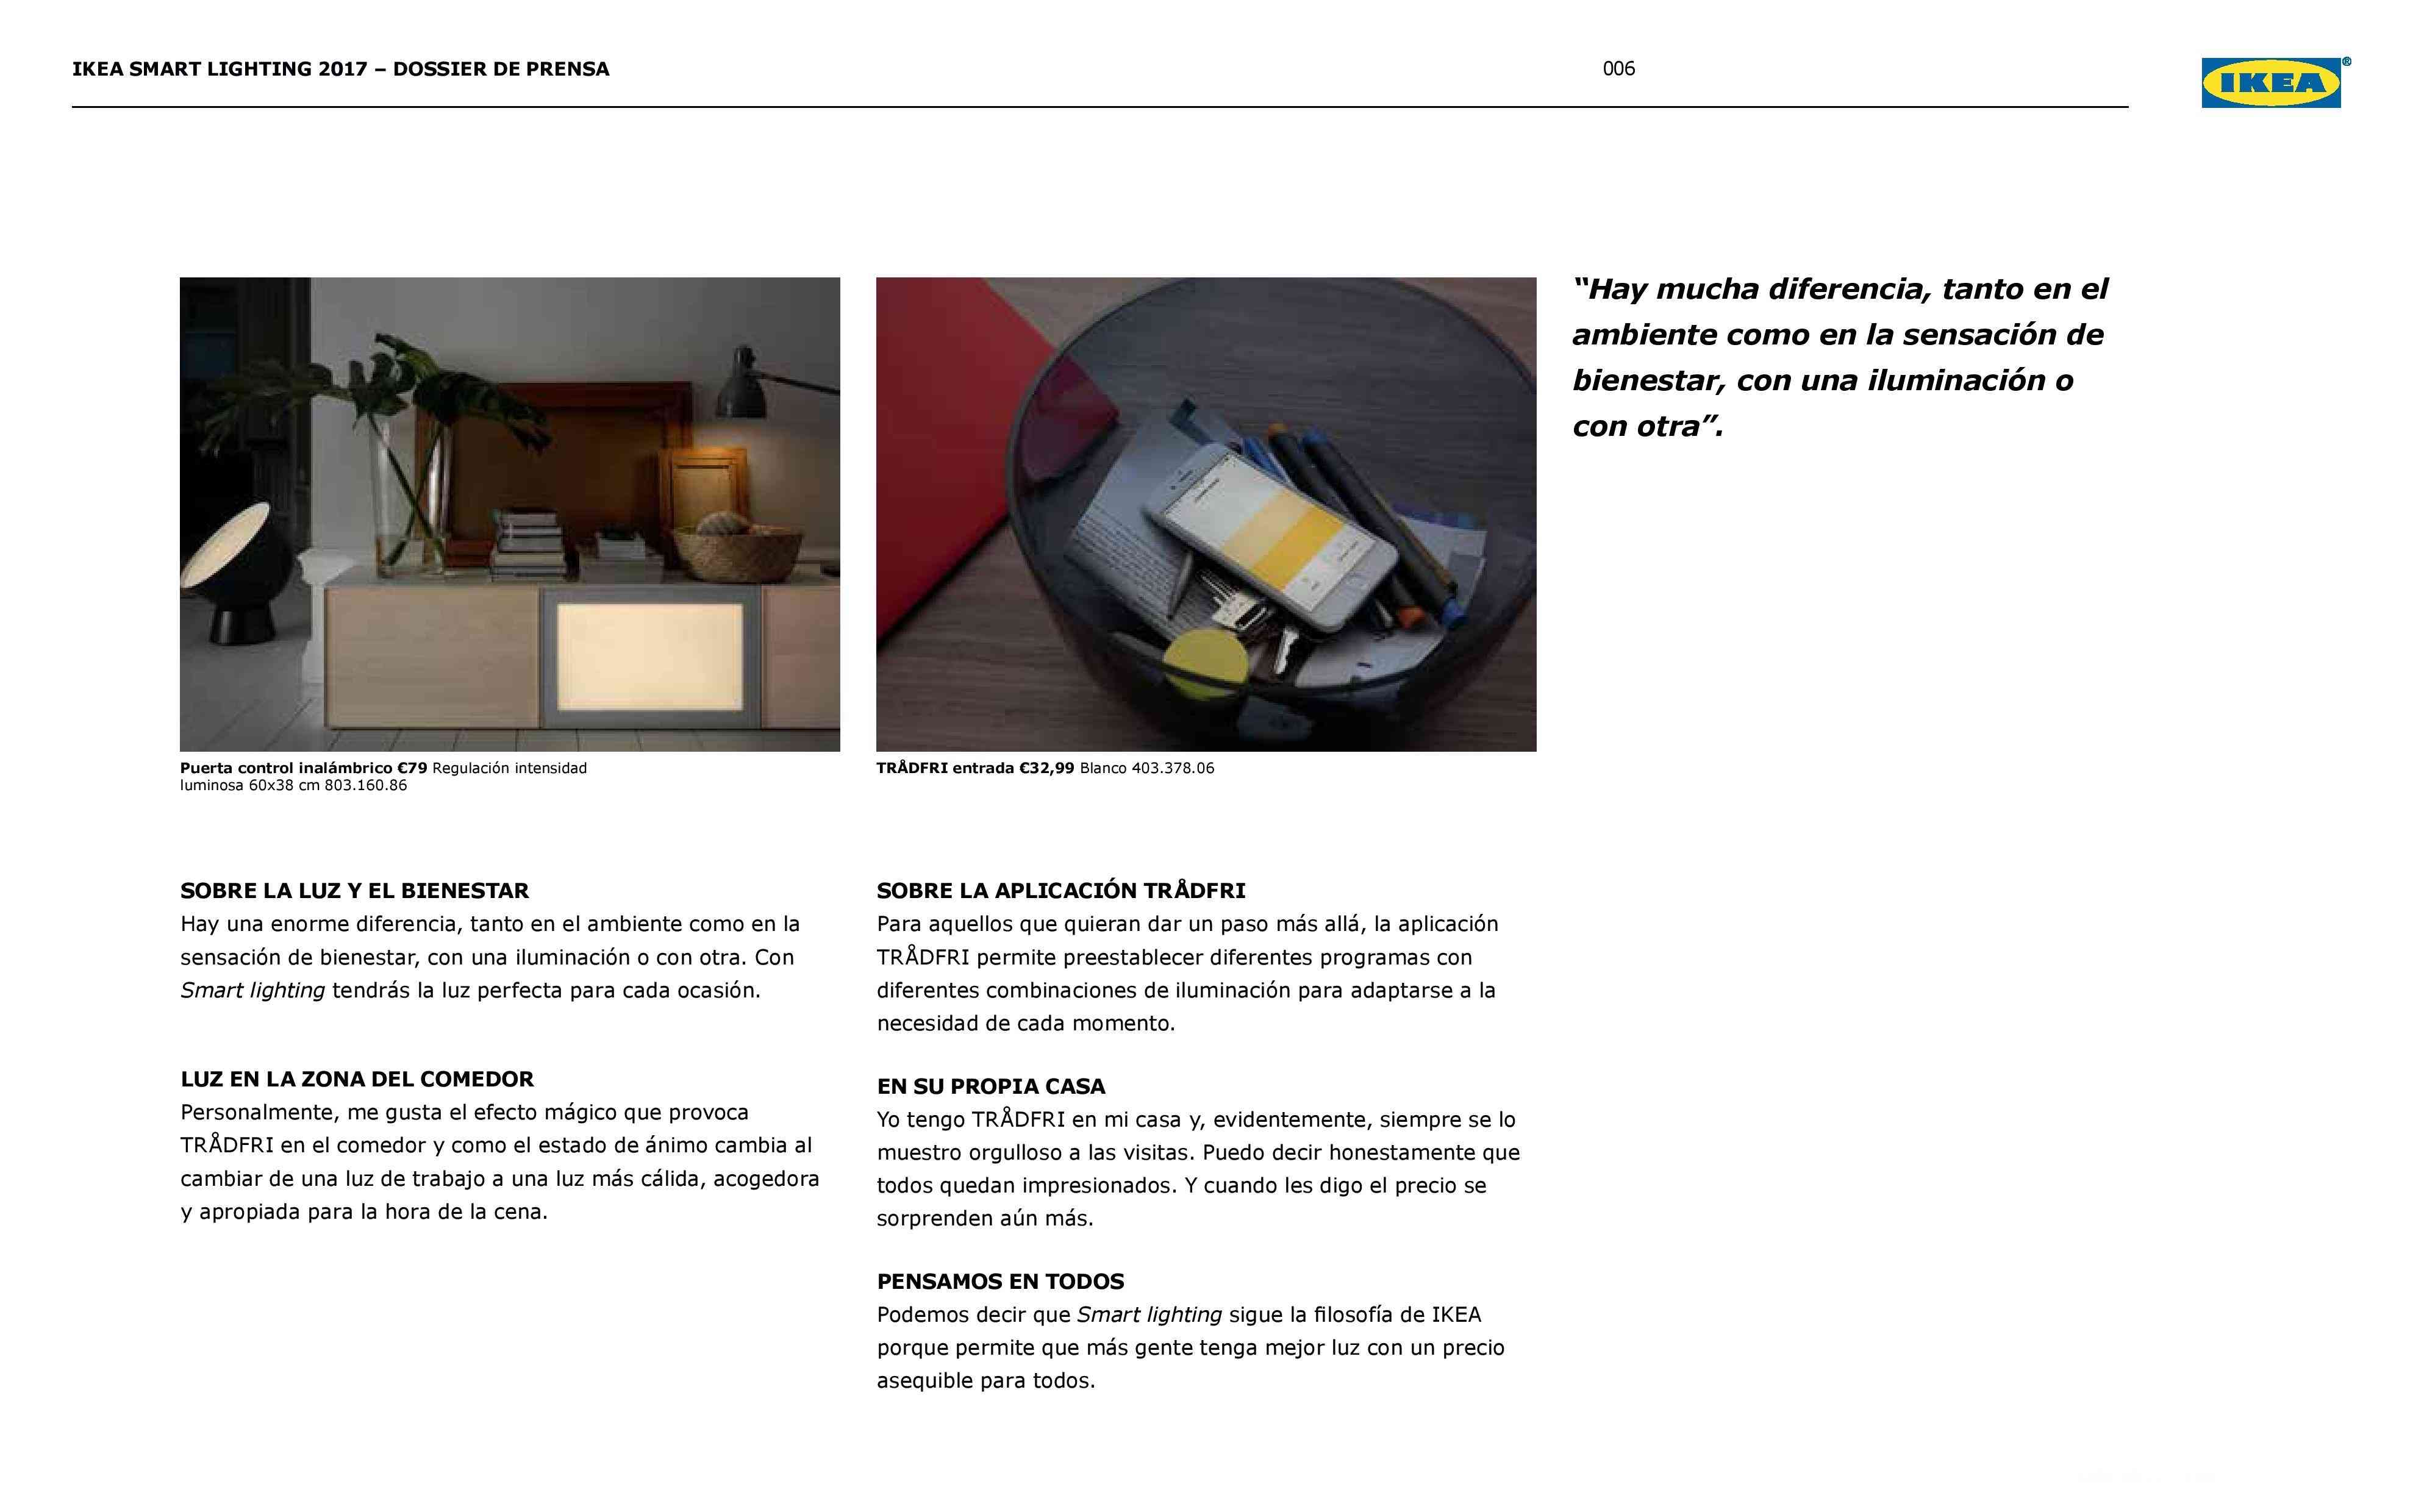 Novedades en iluminación de casas inteligentes con IKEA 62